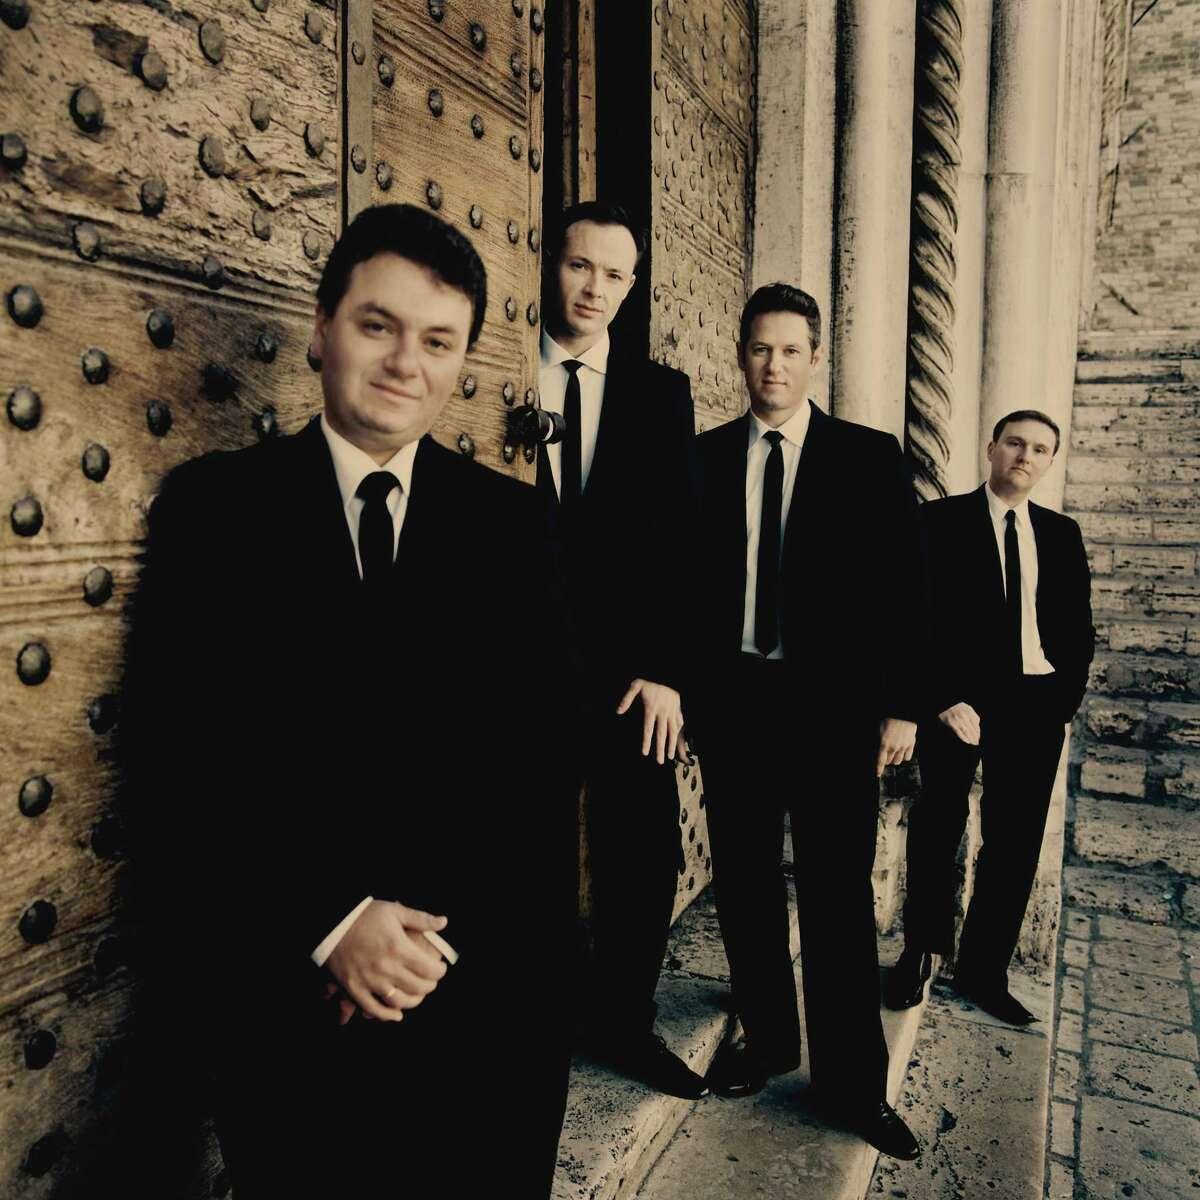 The Jerusalem String Quartet will perform Dmitri Shostakovich quartets at the Rothko Chapel.